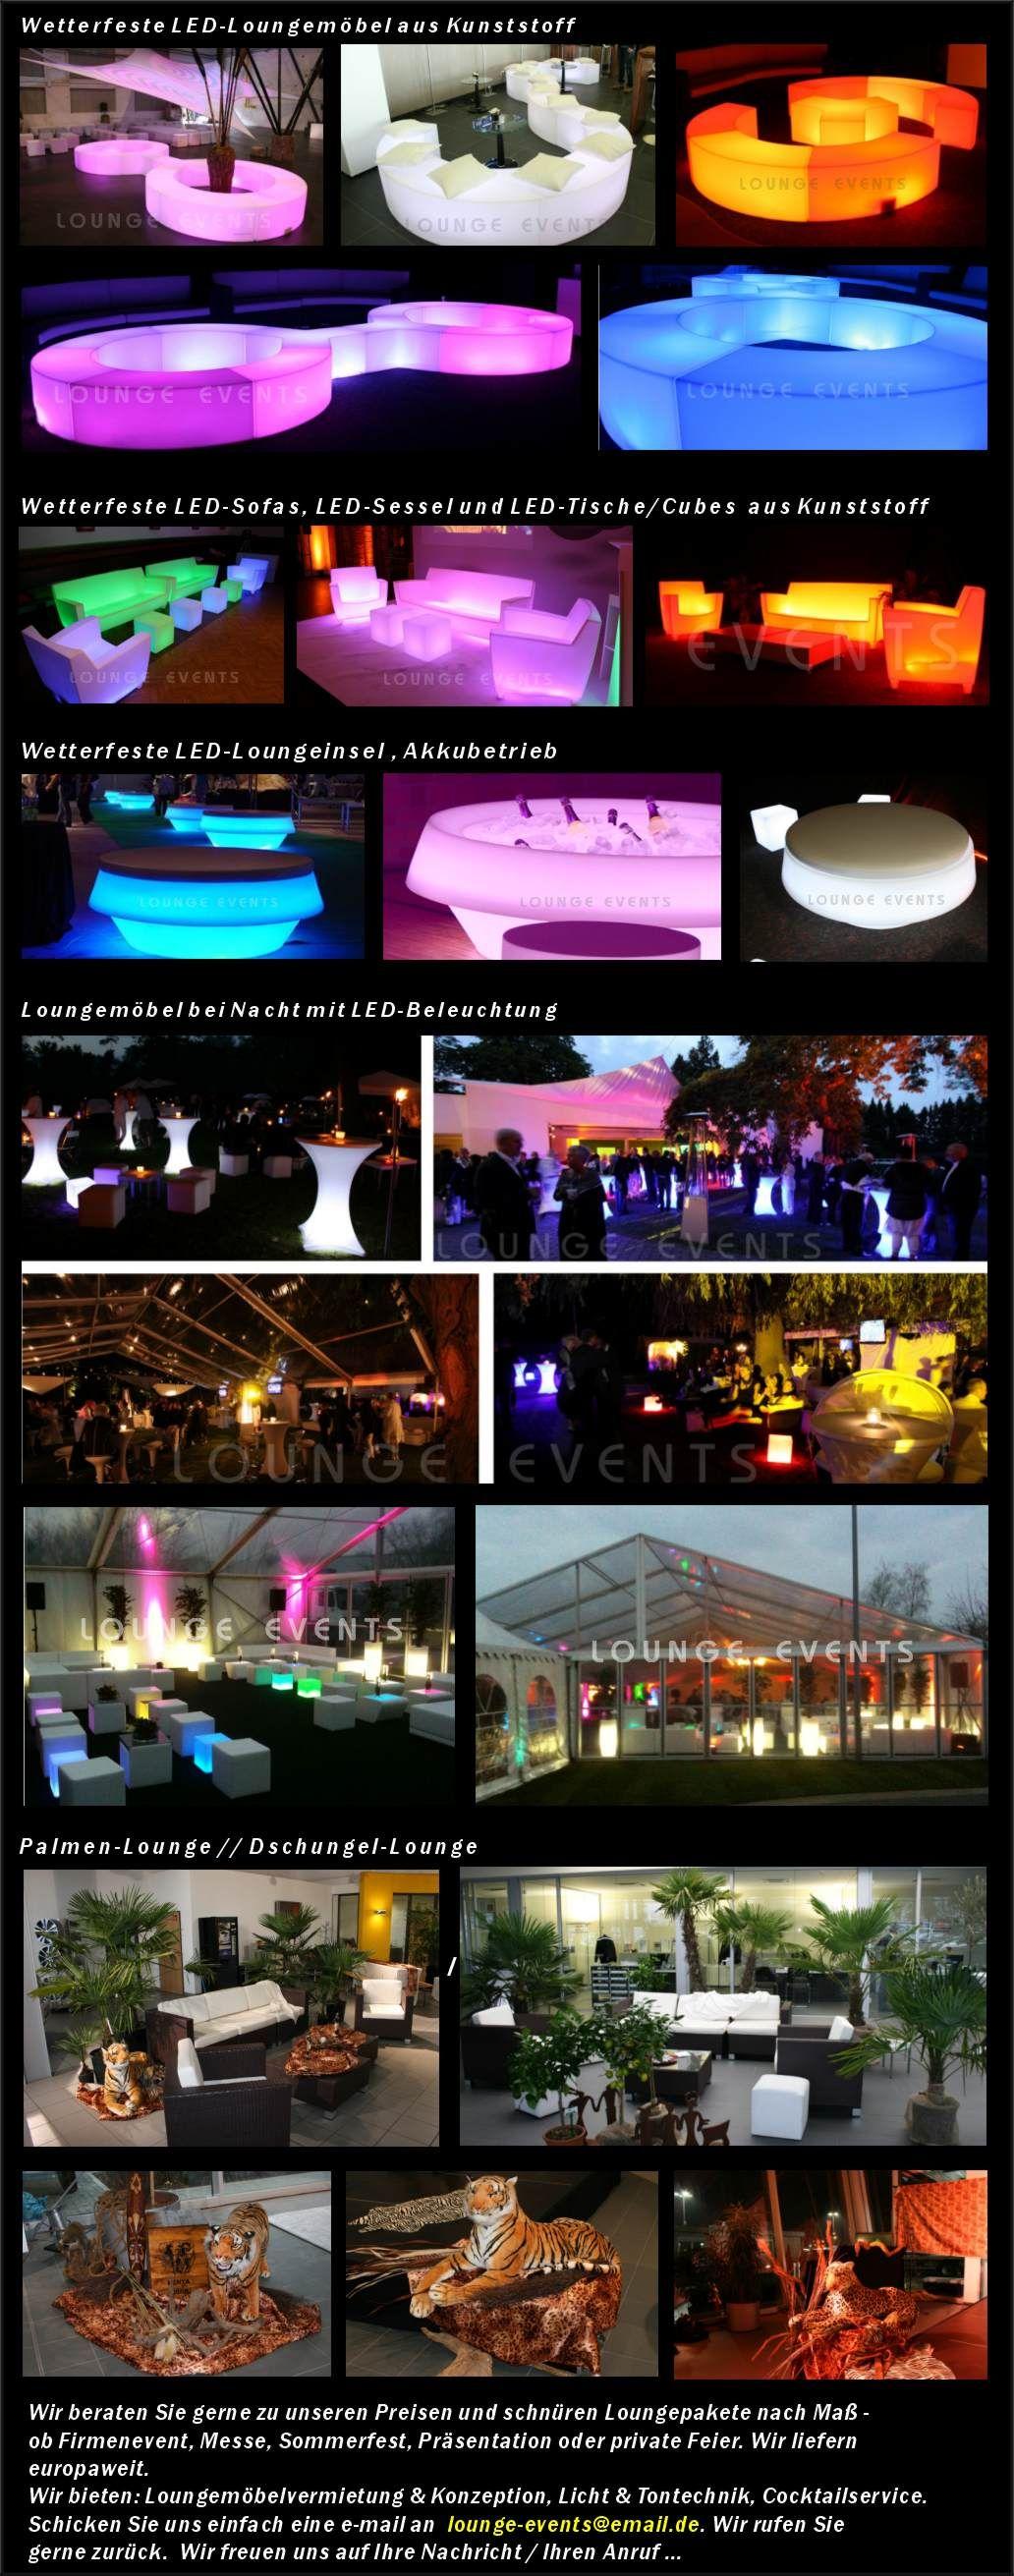 Lounge Events Mietmobel Loungemobel Mieten Led Mobel Verleih Vermietung Decoracao Festa Decoracao Festa